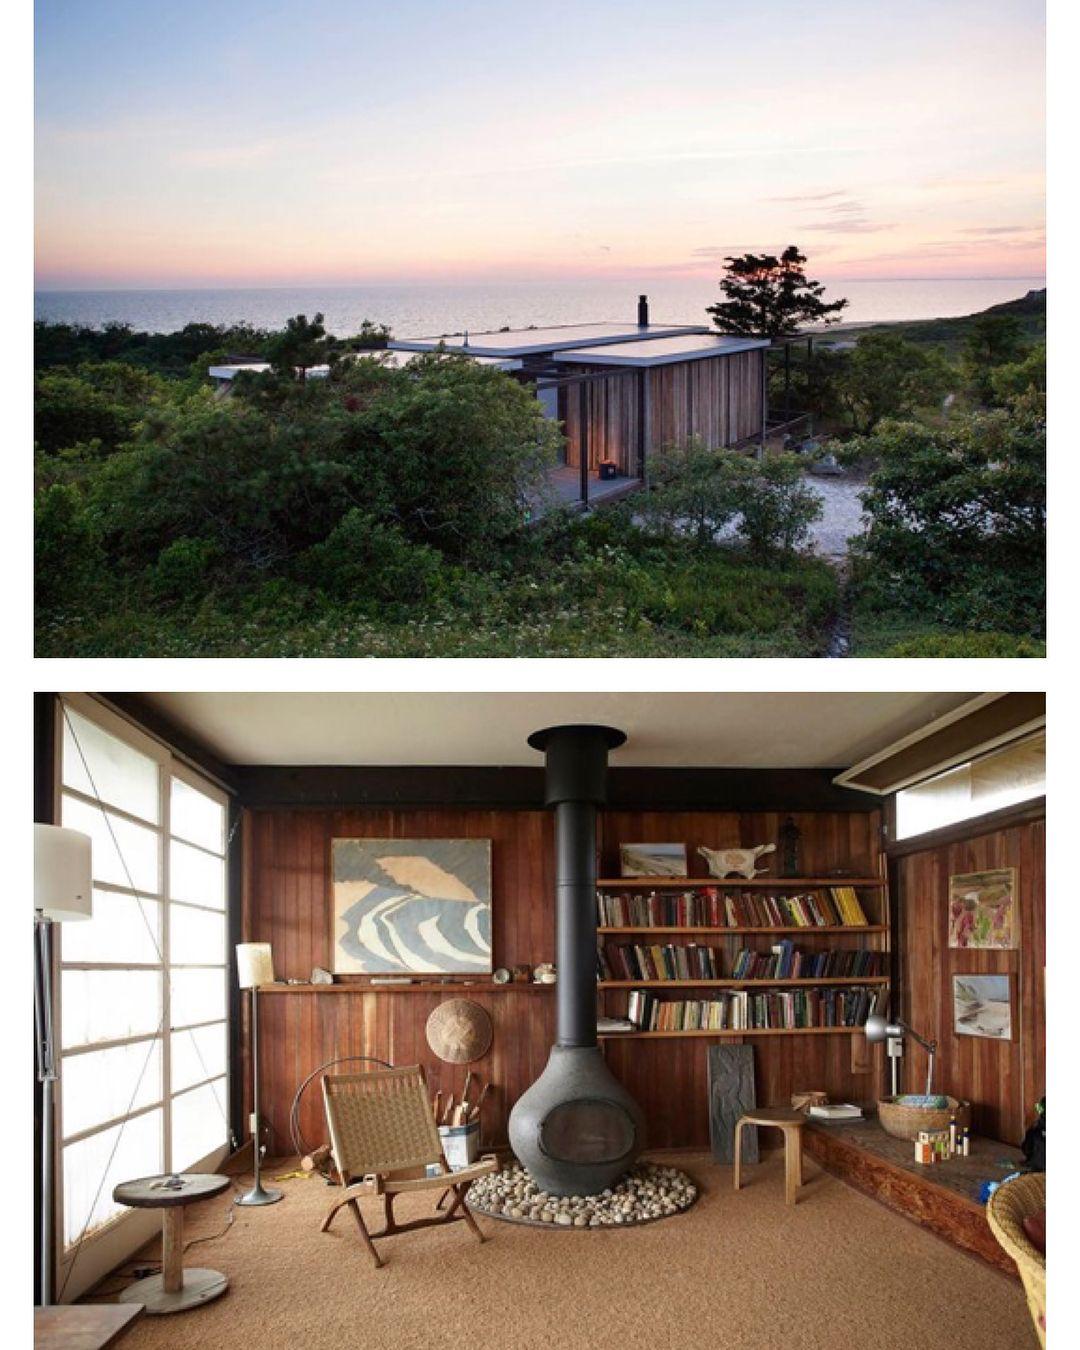 the hatch cottage capecod massachusetts designed by architect